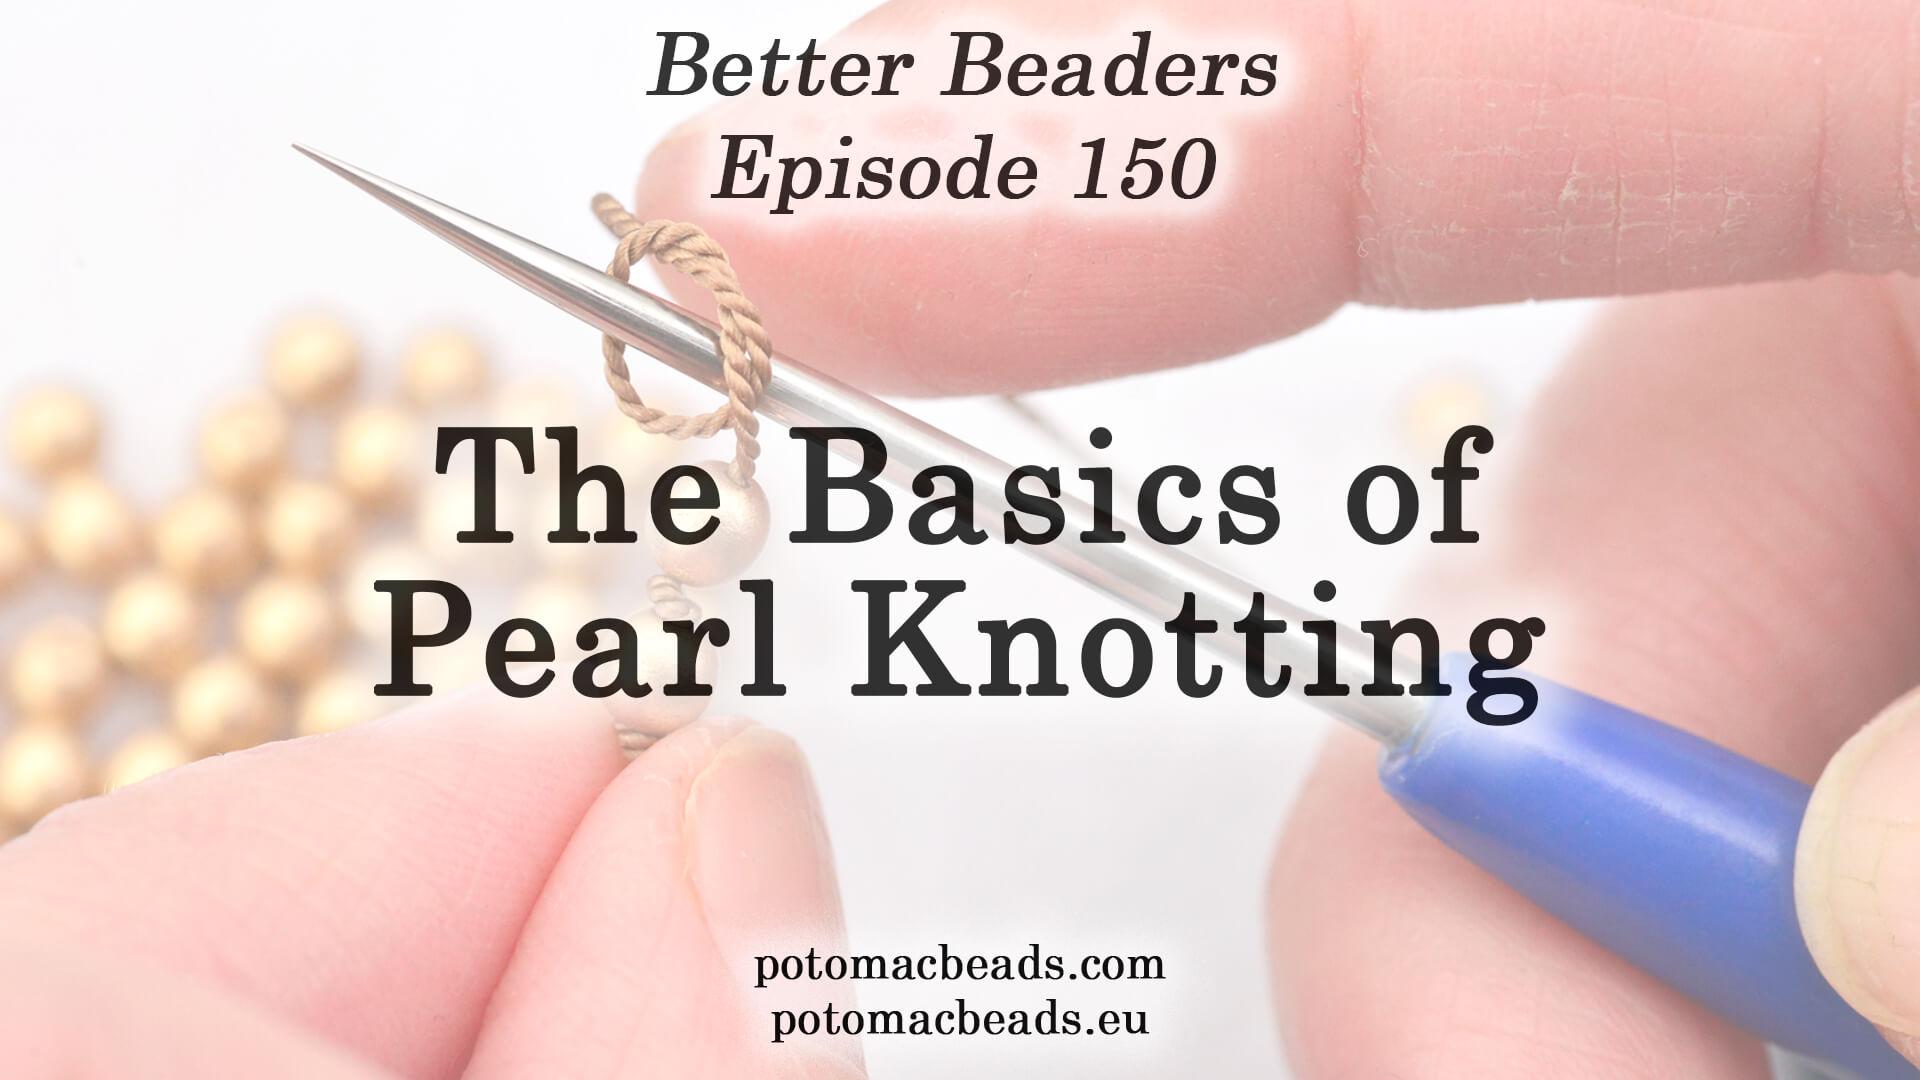 How to Bead / Better Beader Episodes / Better Beader Episode 150 - The Basics of Pearl Knotting